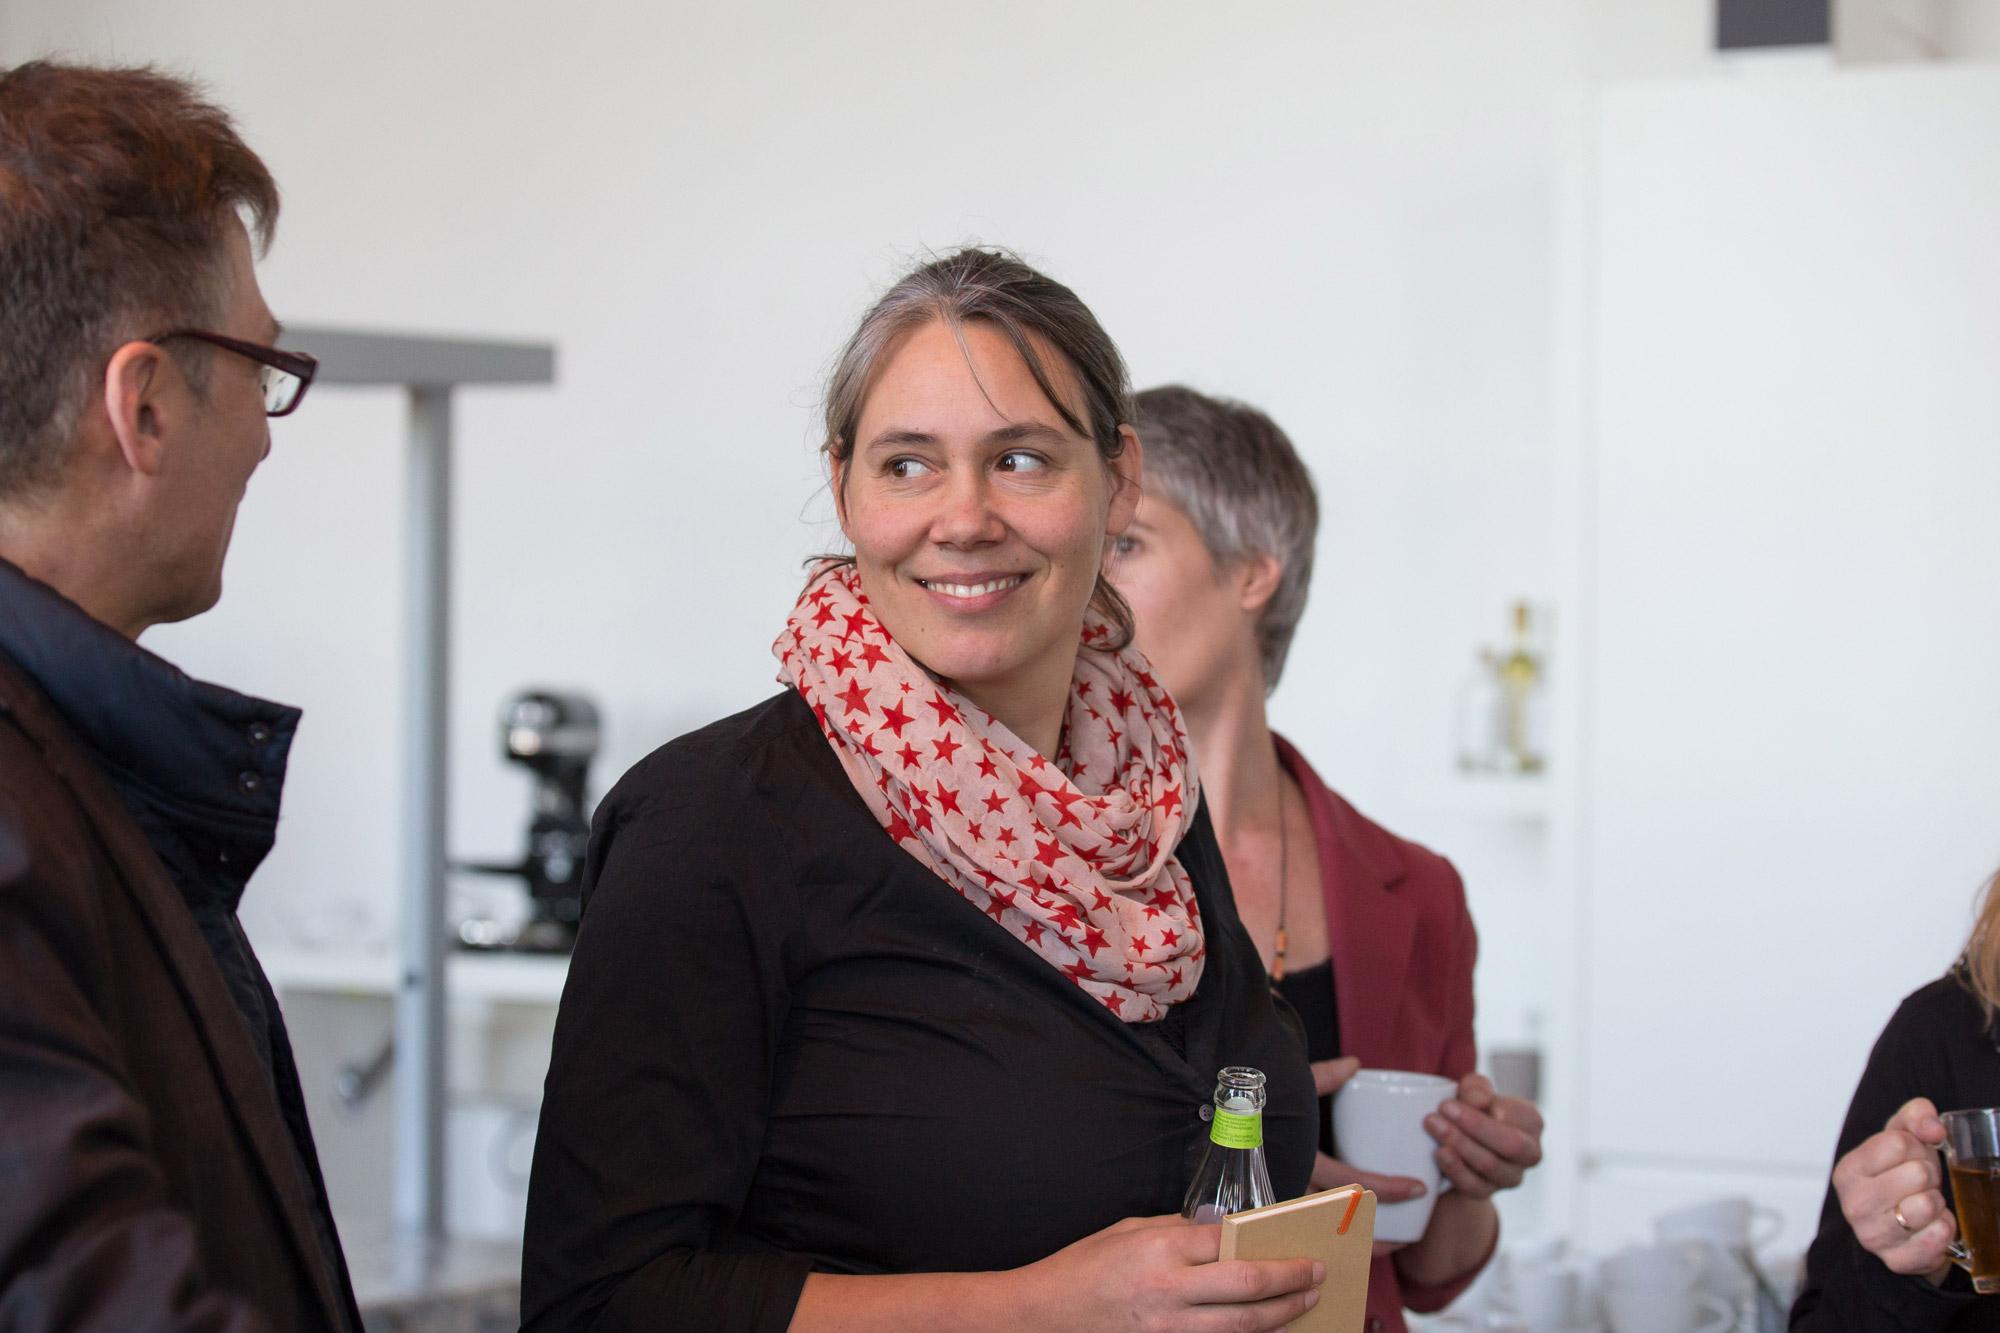 PAN.OPTIKUM, Aktionstheater, Power of Diversity - the Crossing Lines Project, EACEA, Jennifer Rohrbacher, Matthias Rettner, Trine Heller, Passage Festival